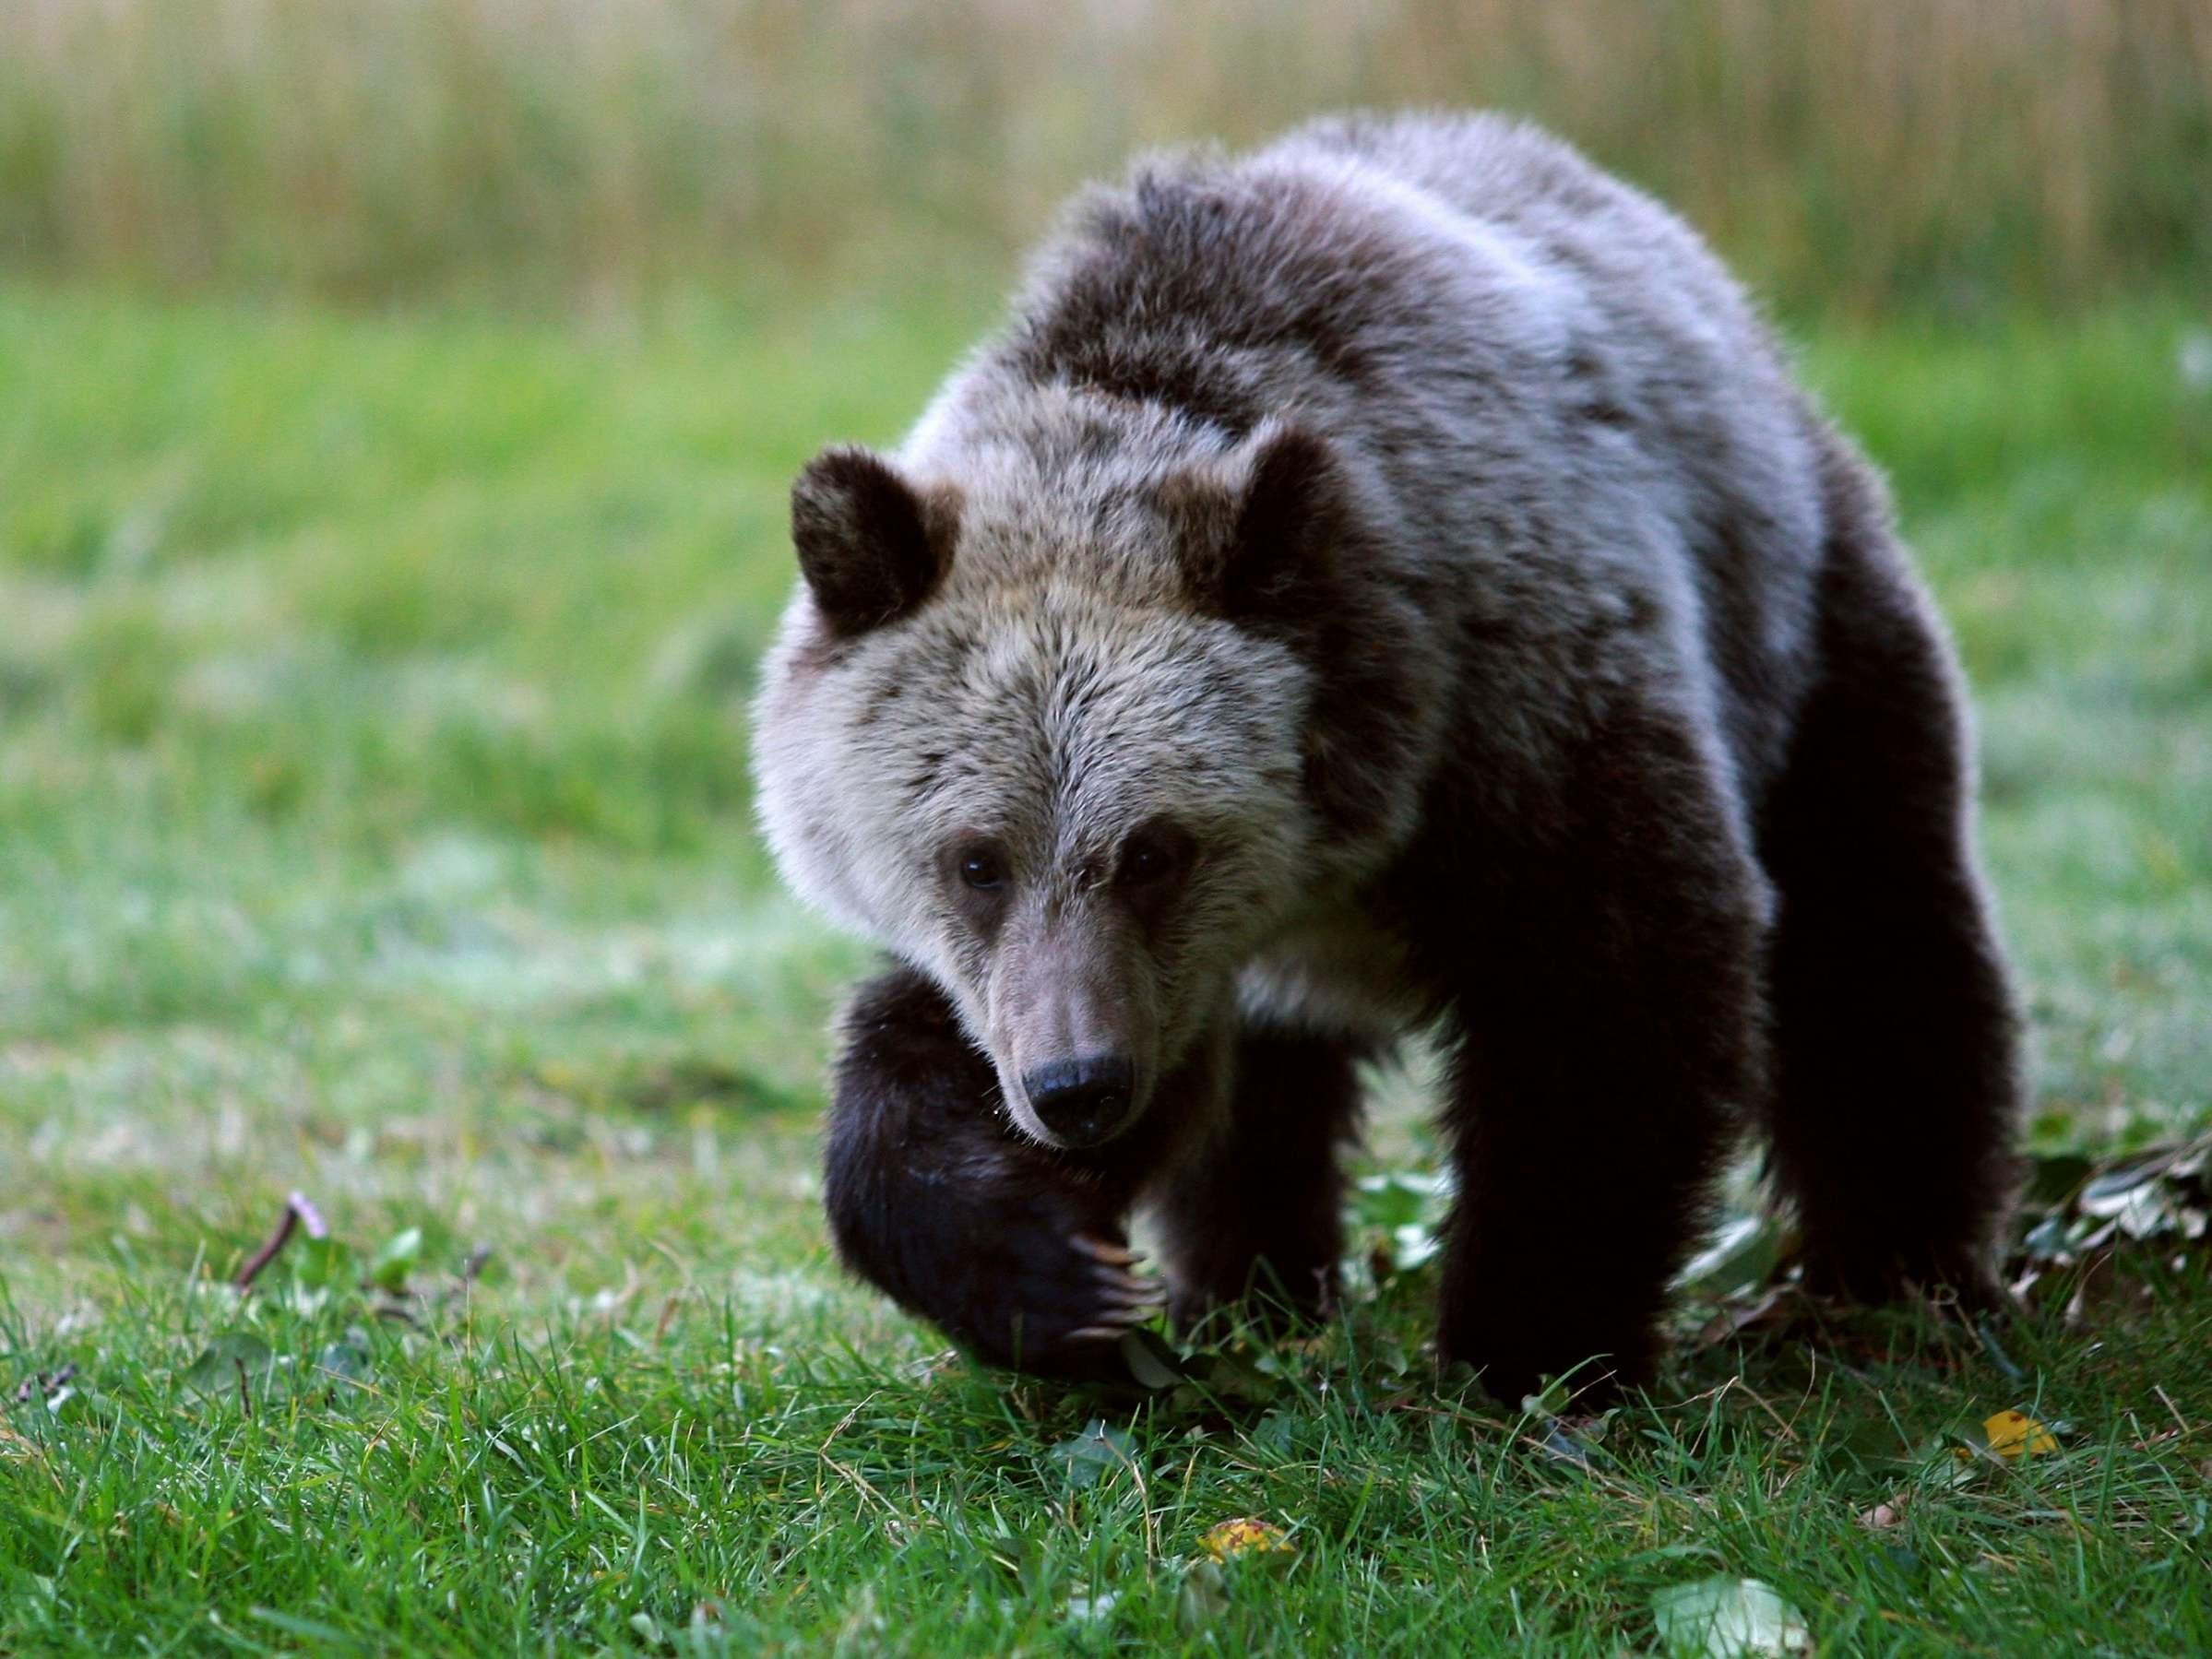 'Amazingly cruel': New Trump public land rules will let hunters kill bear cubs in dens